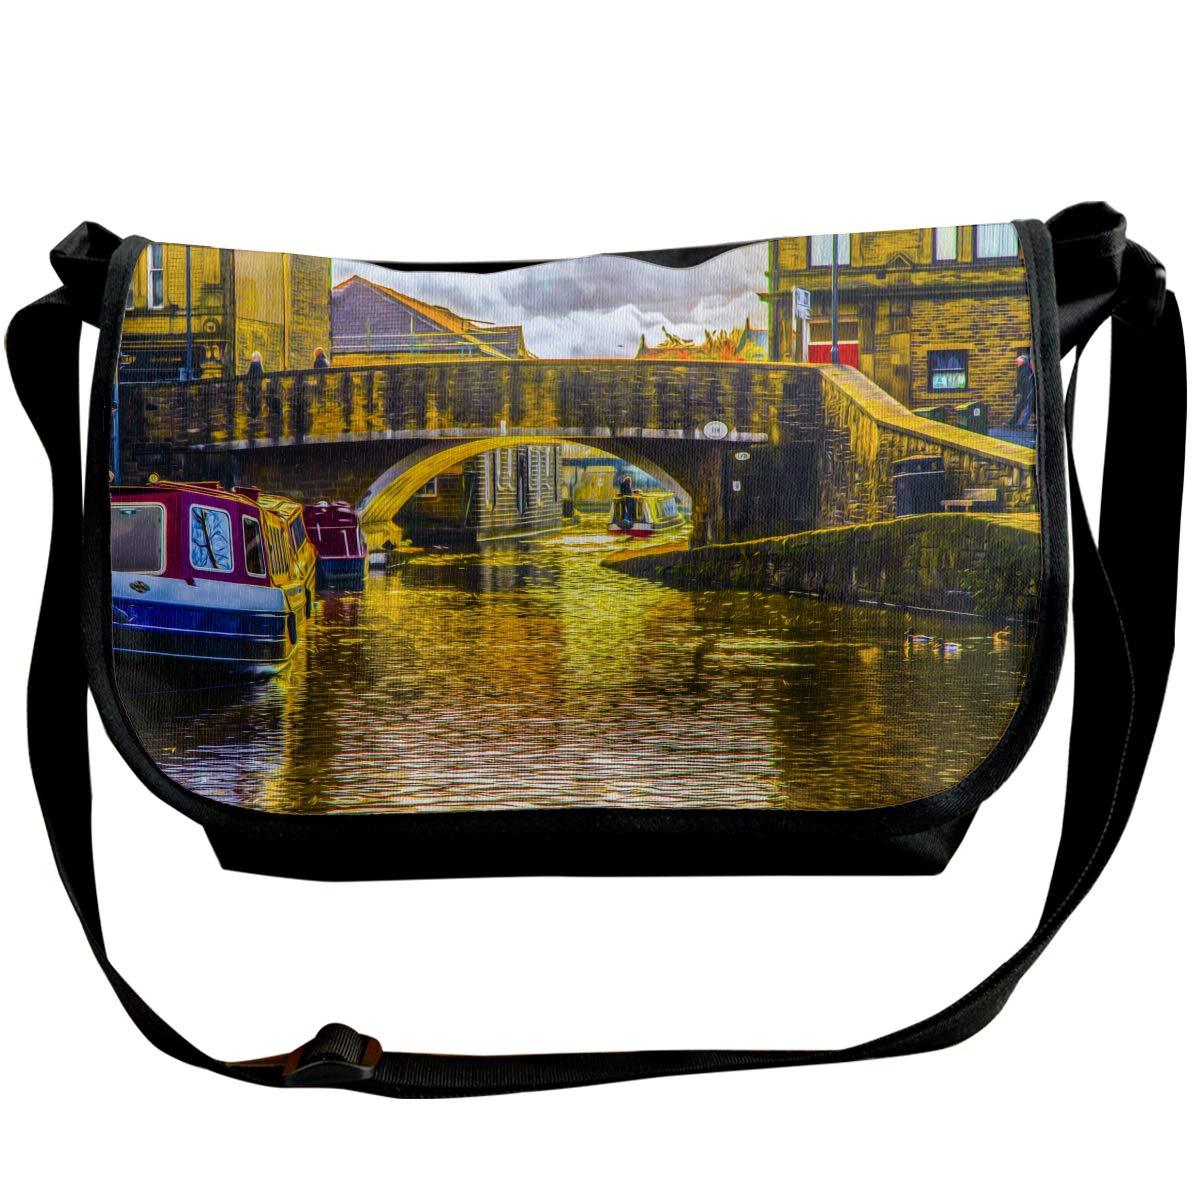 XIANGXIANG SHOP Houseboat On River Oil Painting Fashion Unisex Casual Popular Outdoor Sling Bag Messenger Bag Shoulder Bag